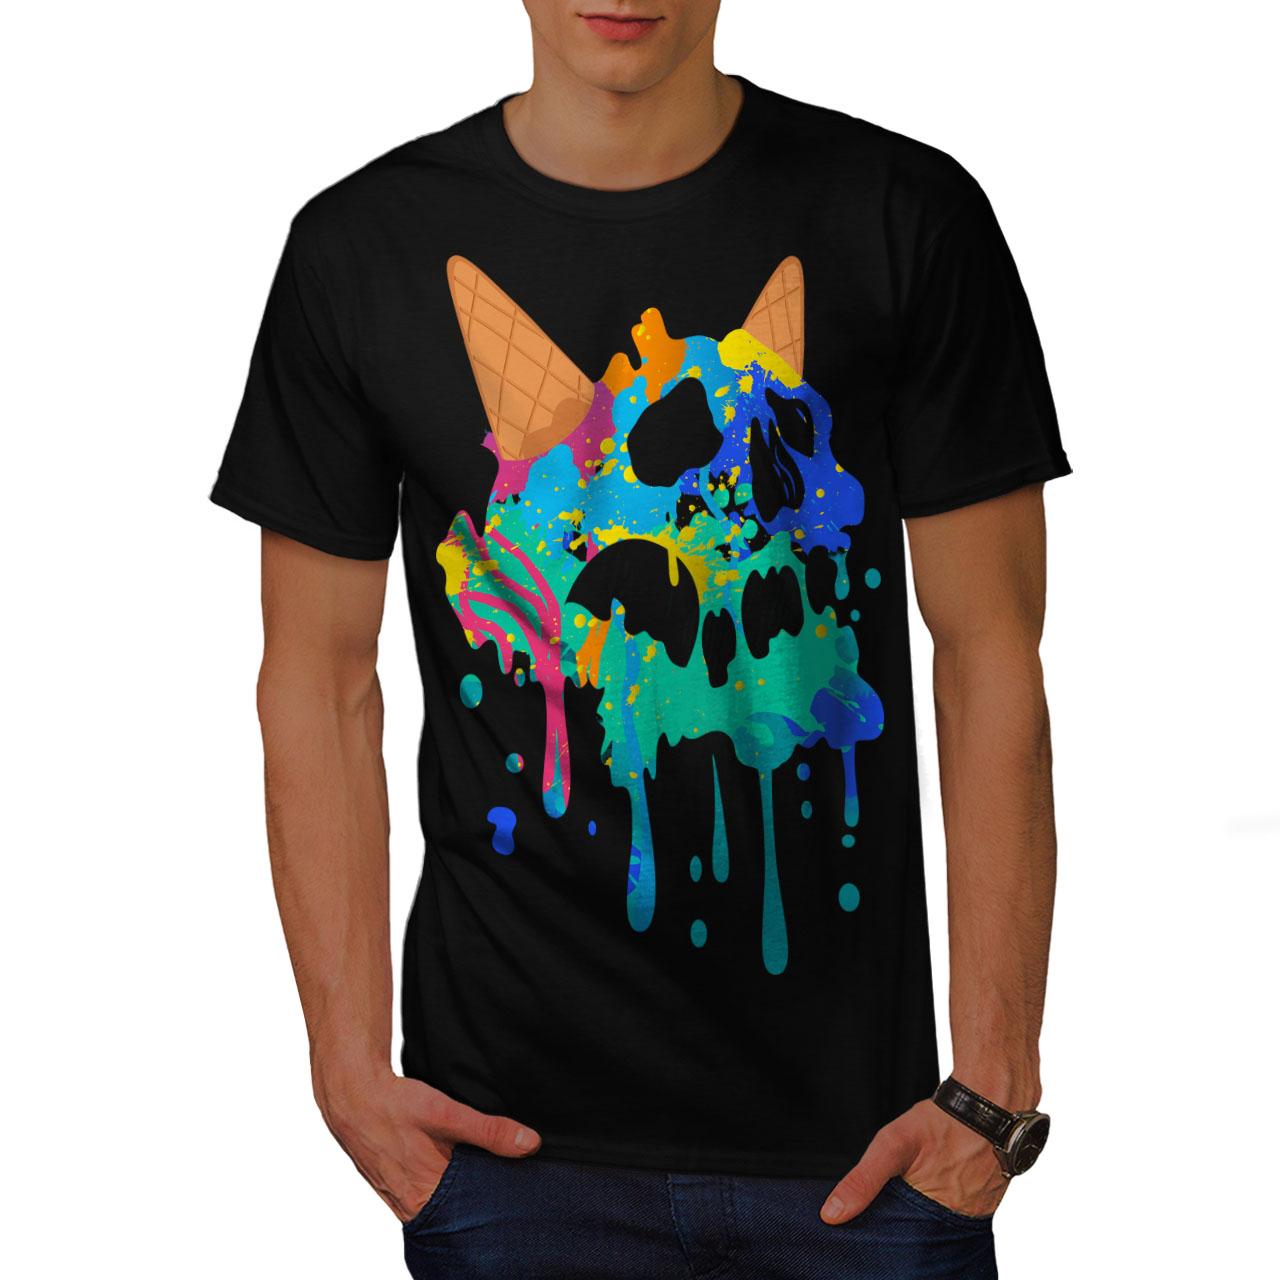 Wafer Graphic Design Tee Wellcoda Skull Ice Cream Junk Womens V-Neck T-shirt